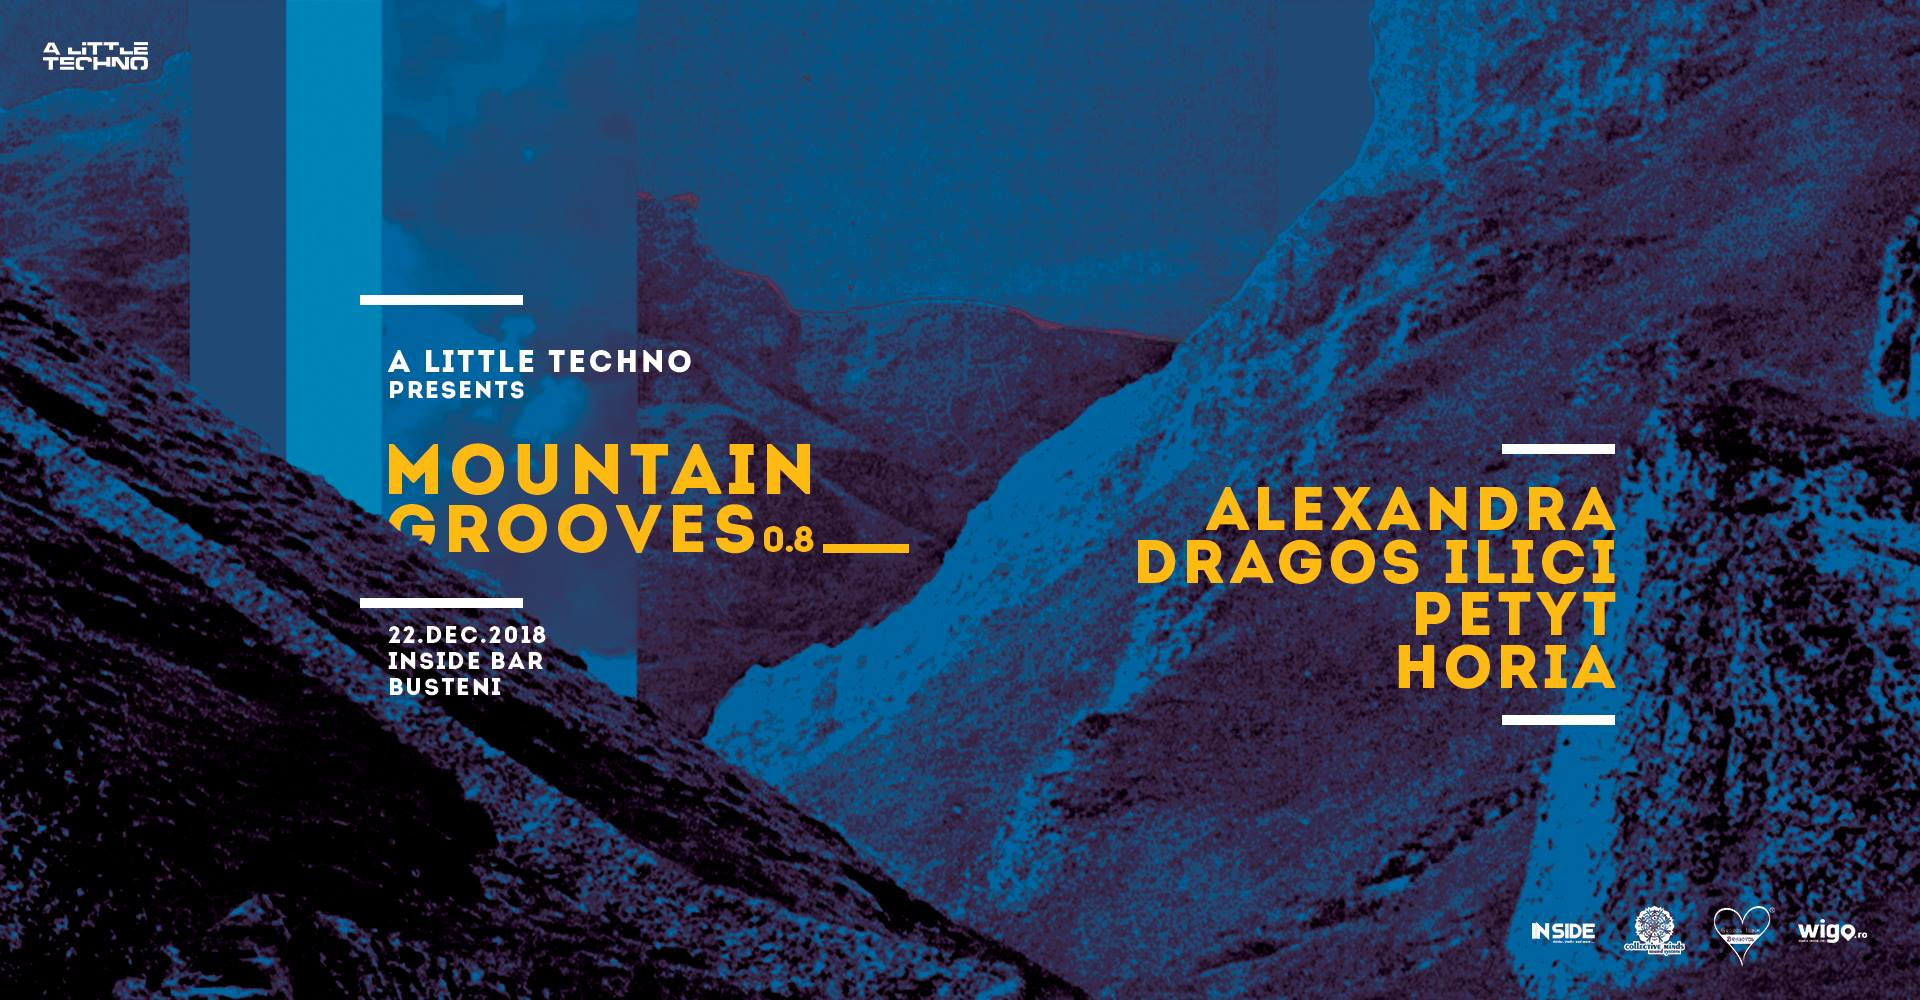 Mountain Grooves 008 Alexandra/ Dragos Ilici/ Horia/ Petyt